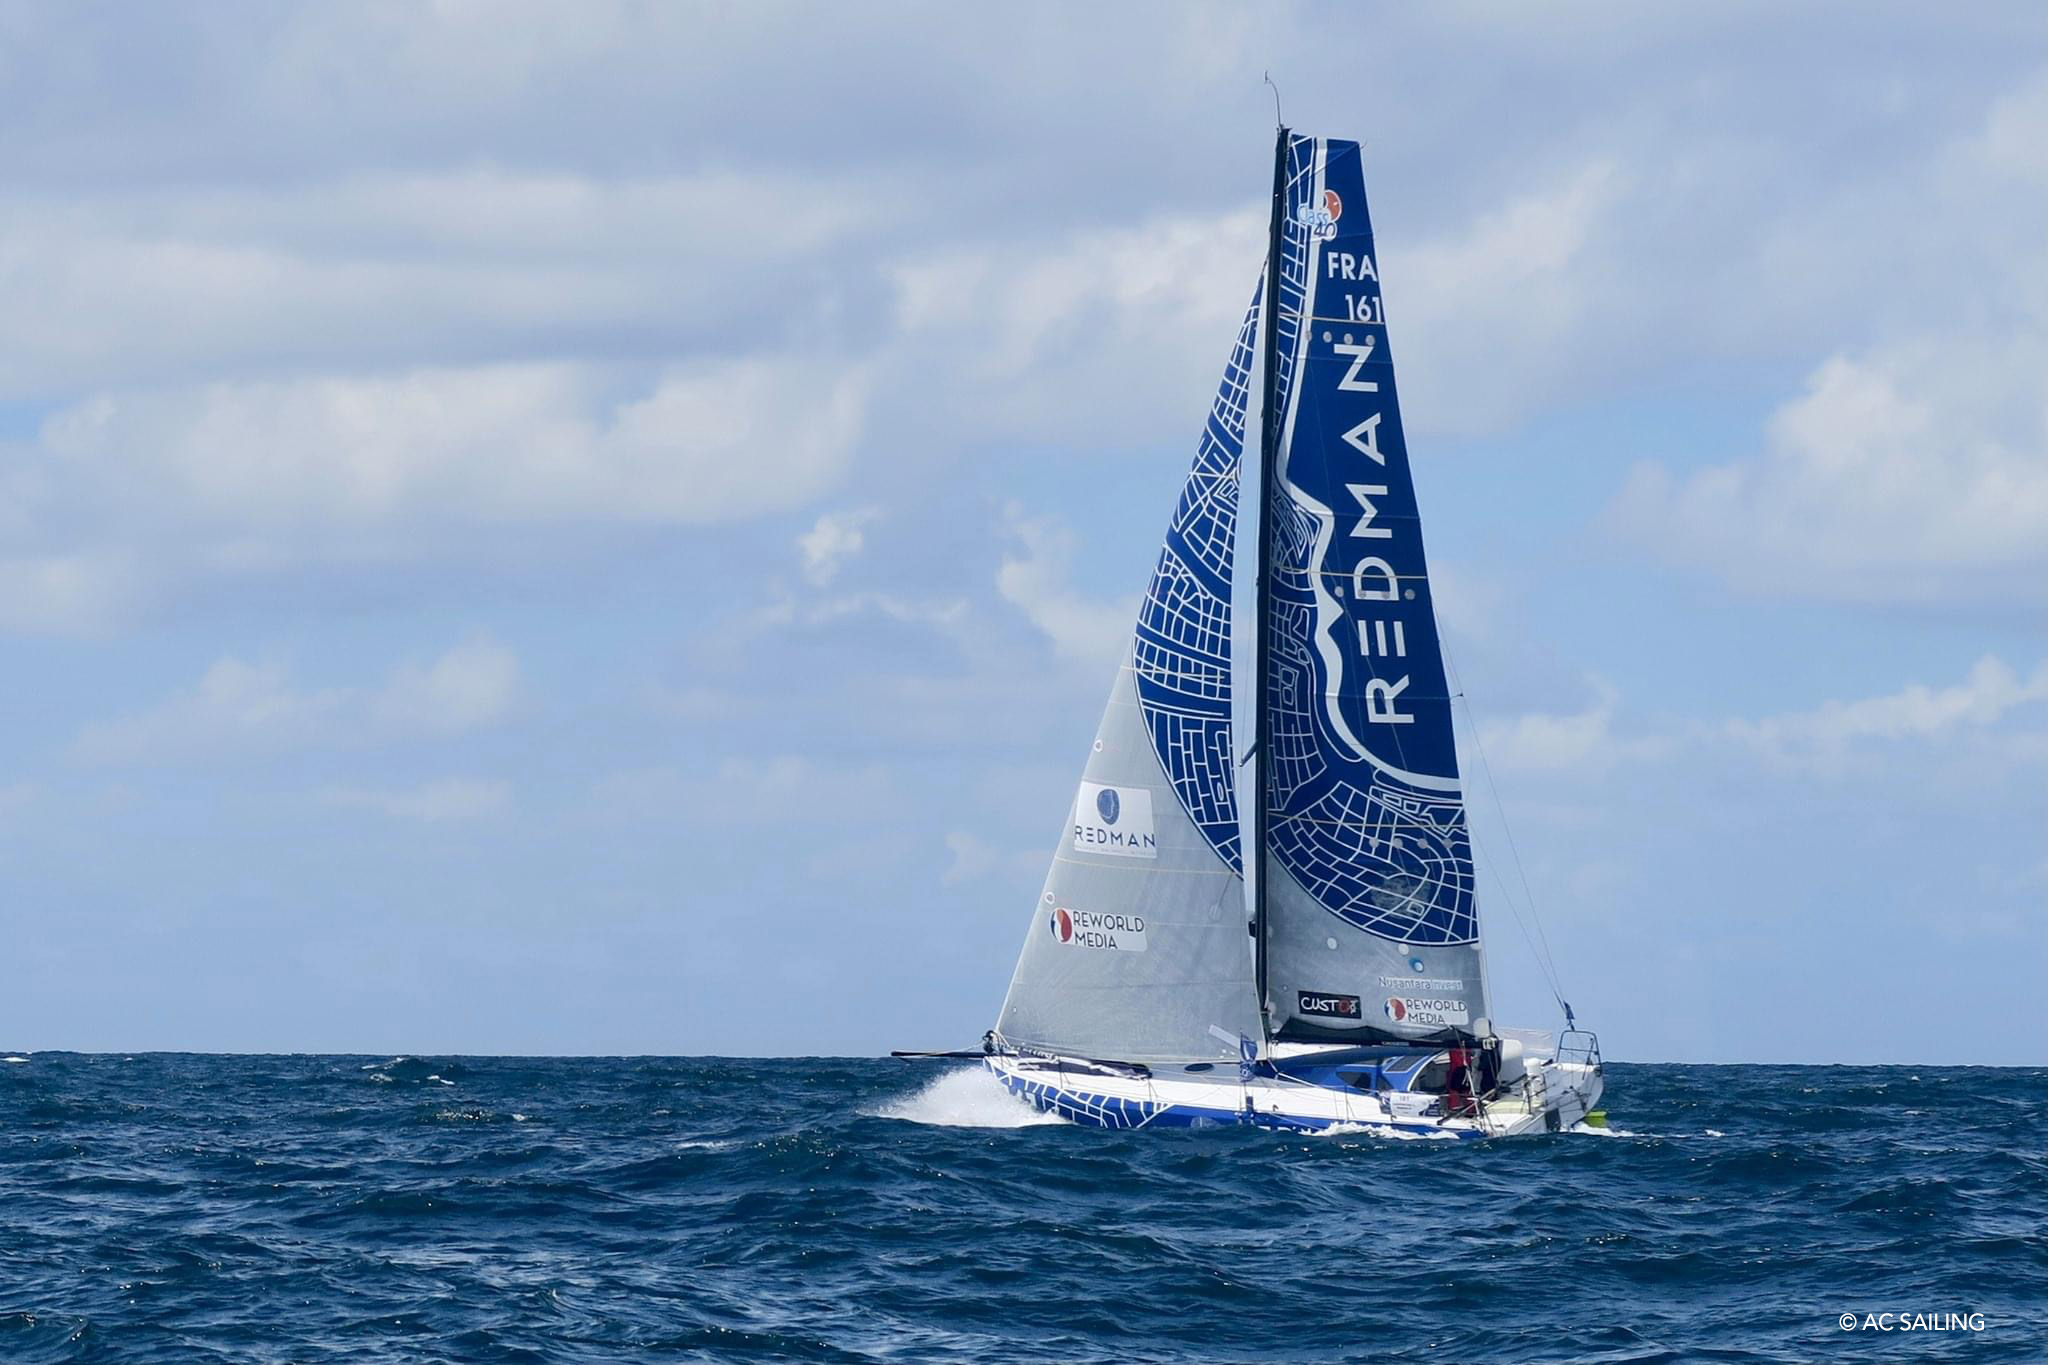 Reedman Sailing